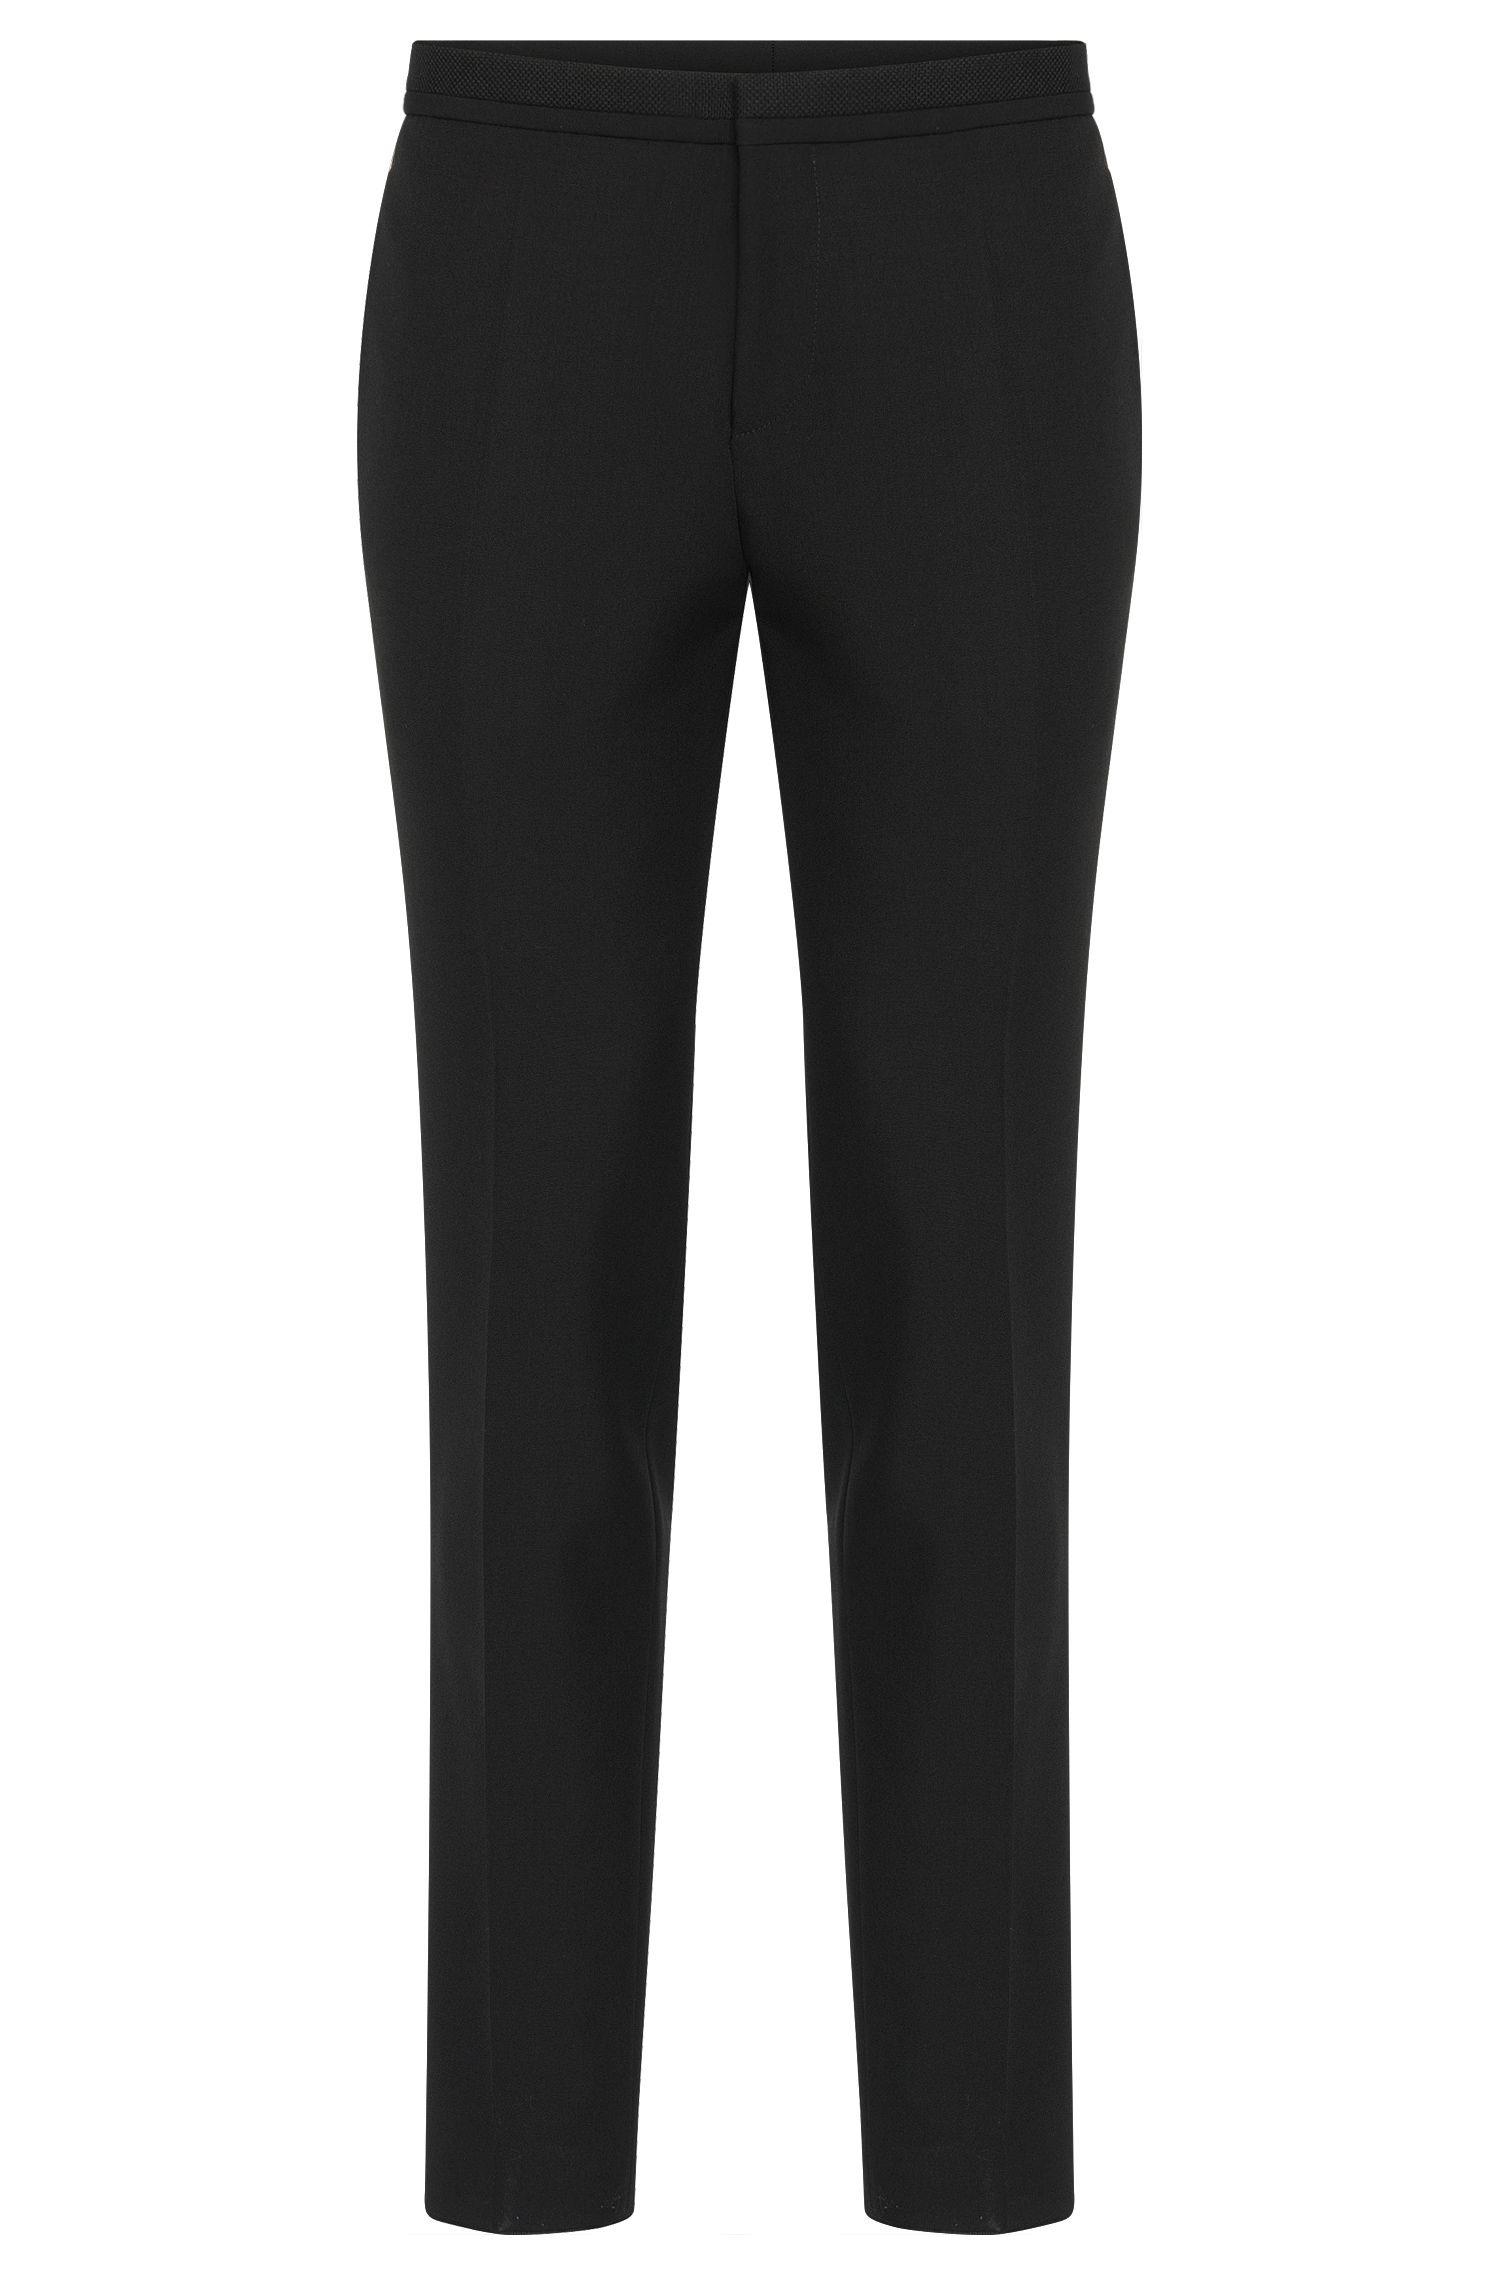 'Wynn' | Extra Slim Fit, Virgin Wool Mohair Dress Pants